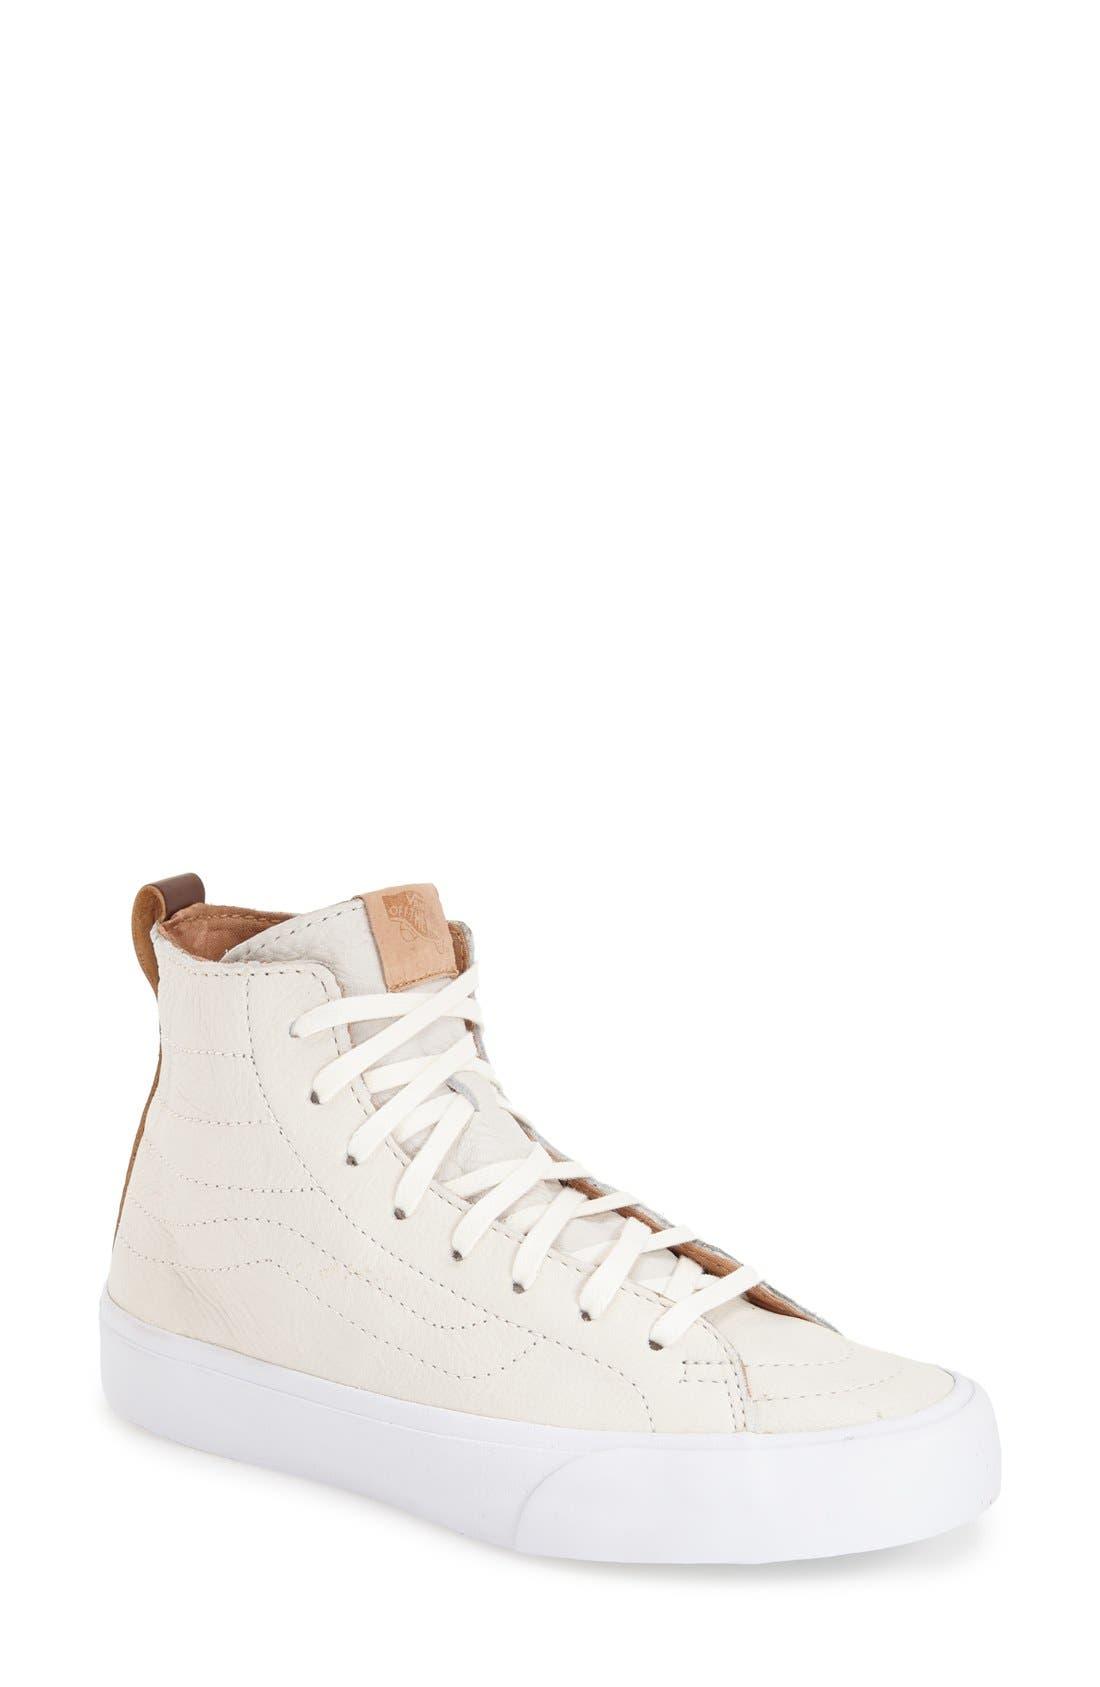 Alternate Image 1 Selected - Vans 'Sk8-Hi - Decon' Sneaker (Women)